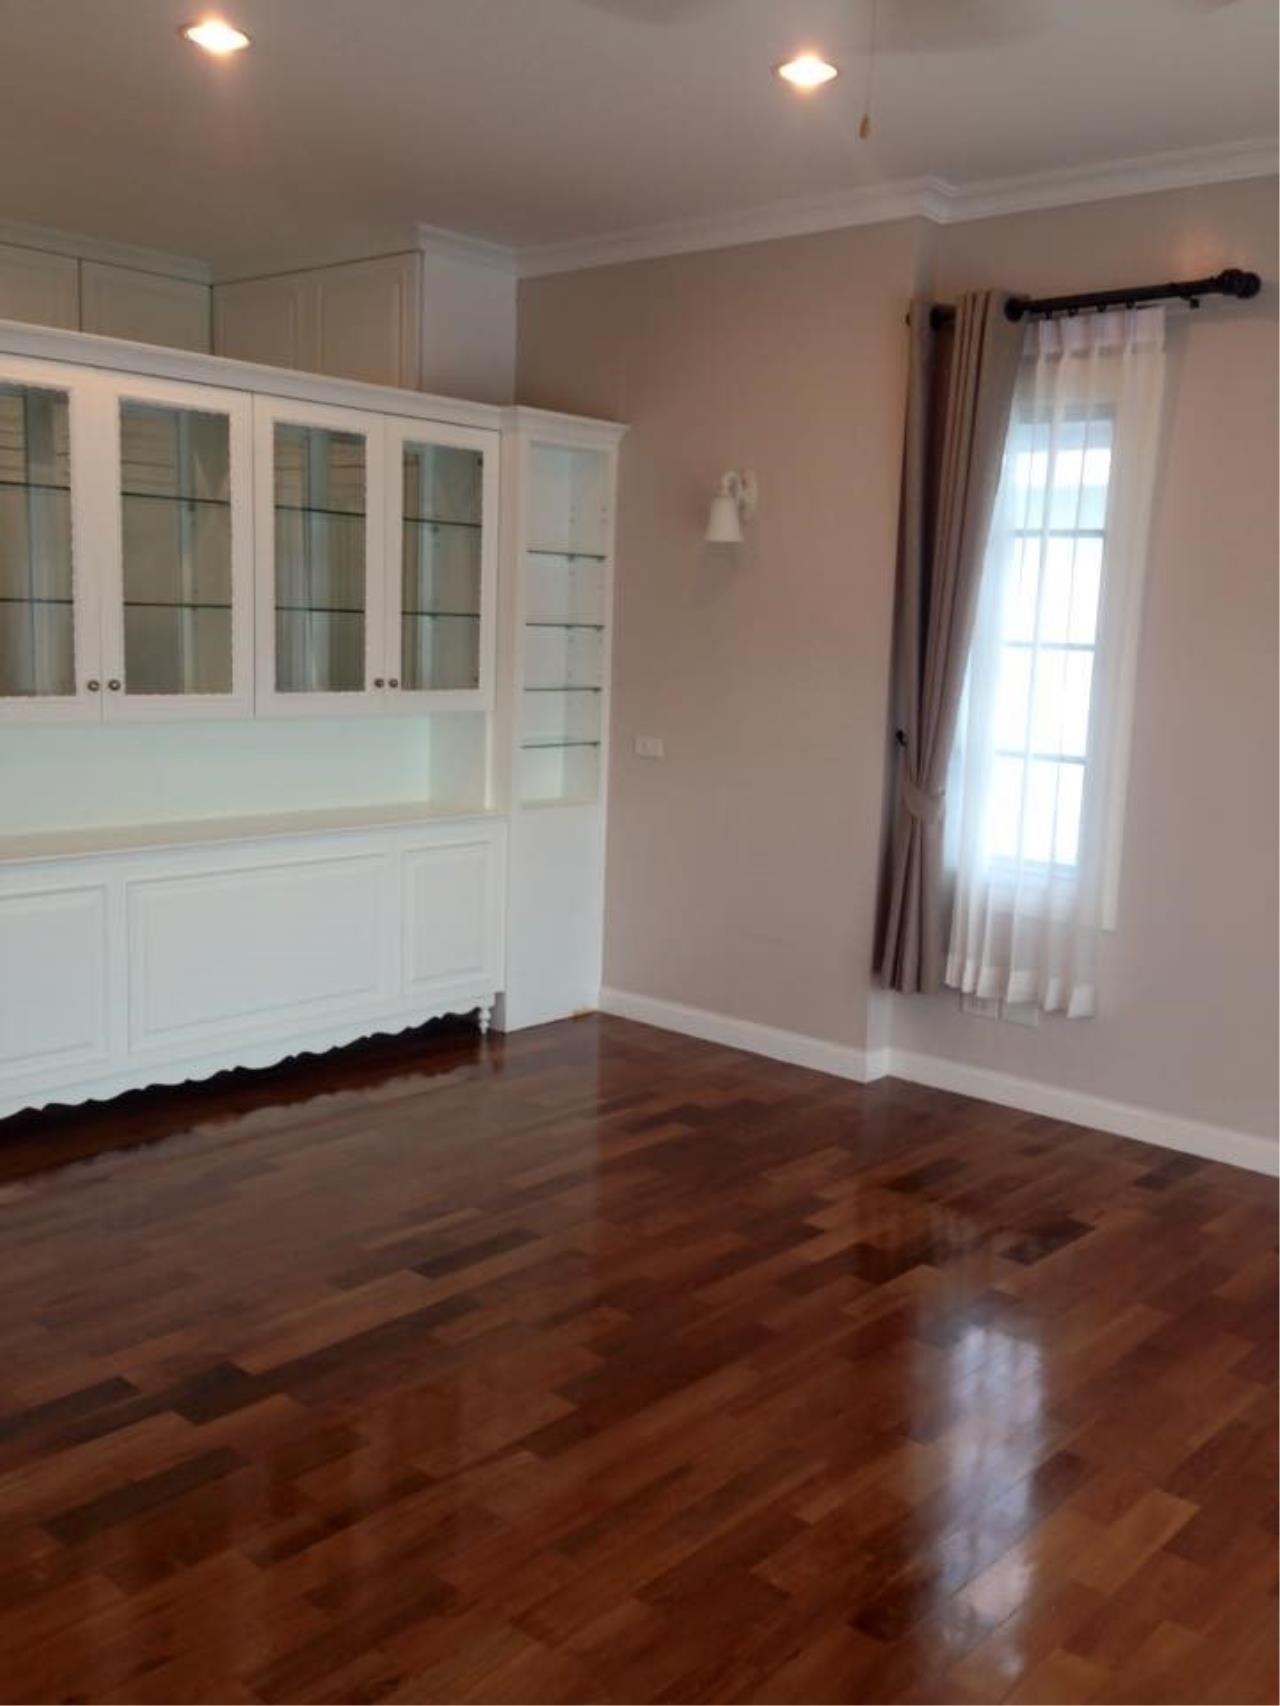 Piri Property Agency's 3 Plus 1 Bedroom Single House for Rent - Fantasia Villa 11